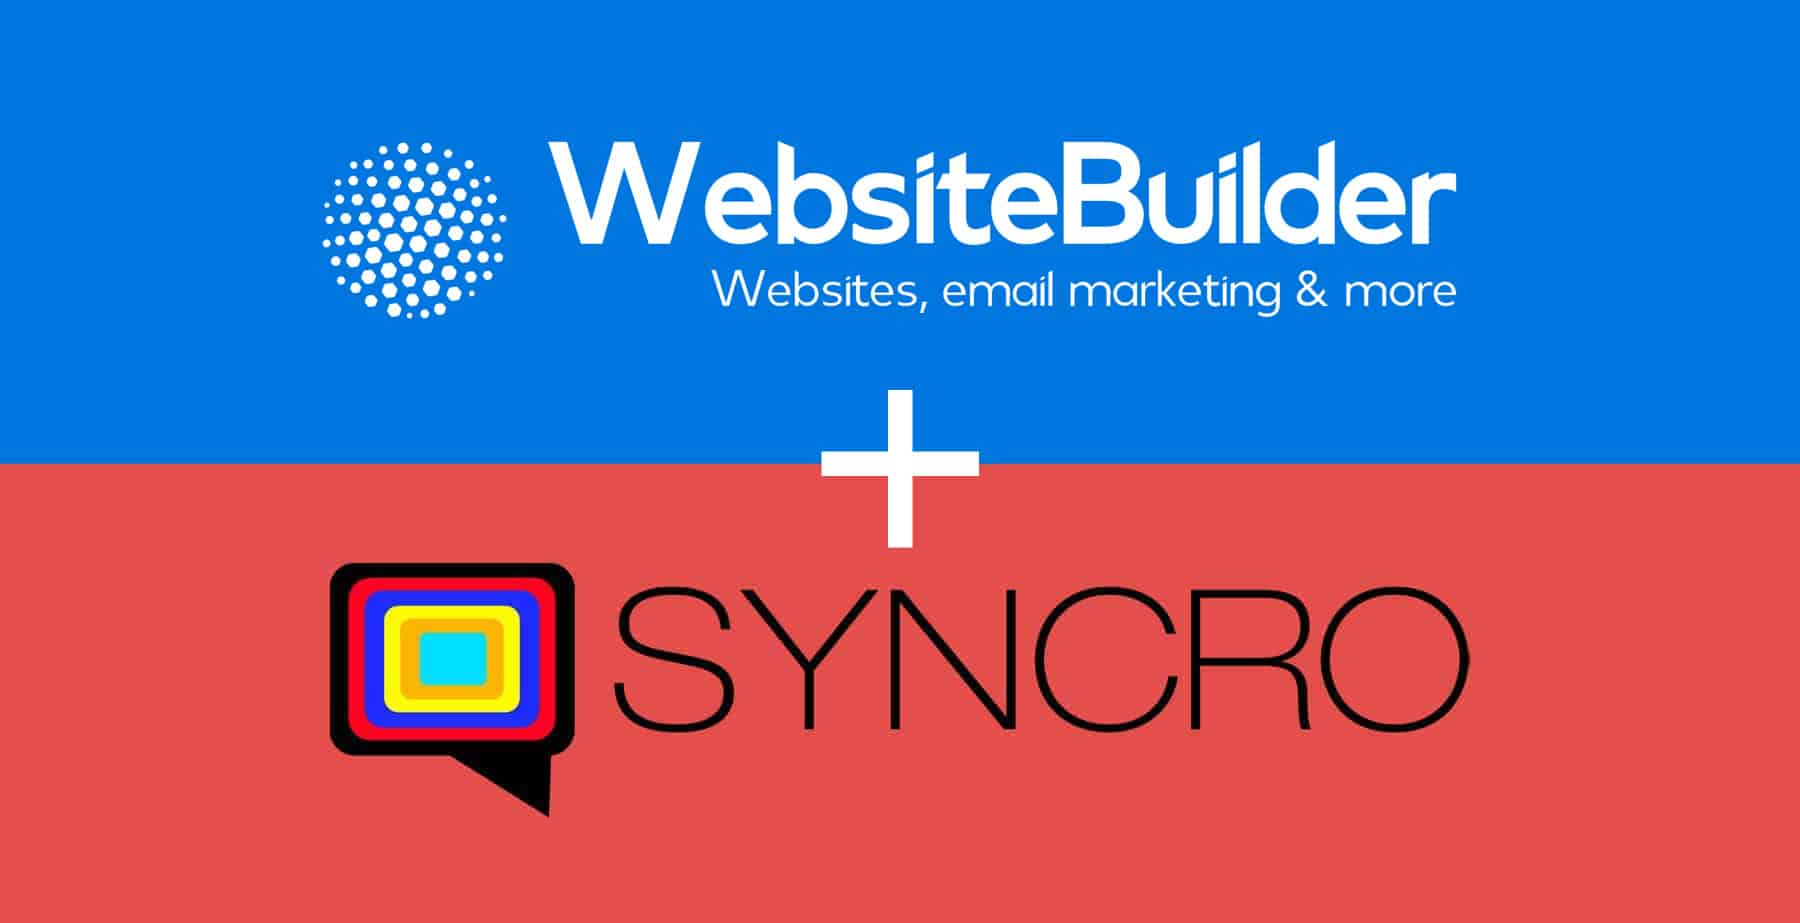 Live chat software for WebsiteBuilder – Installation Instructions